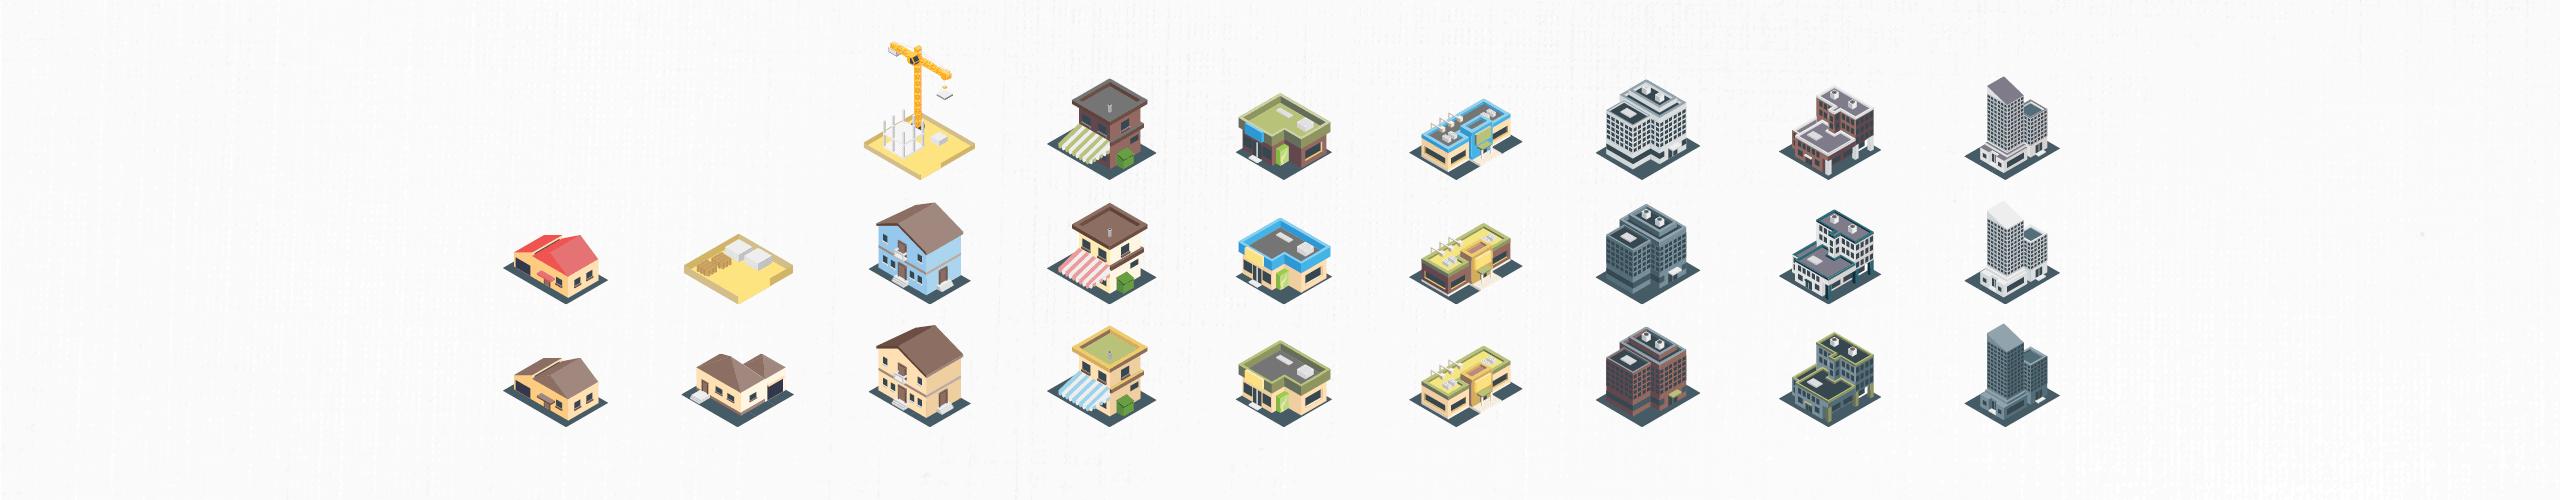 Hendry building illustrations